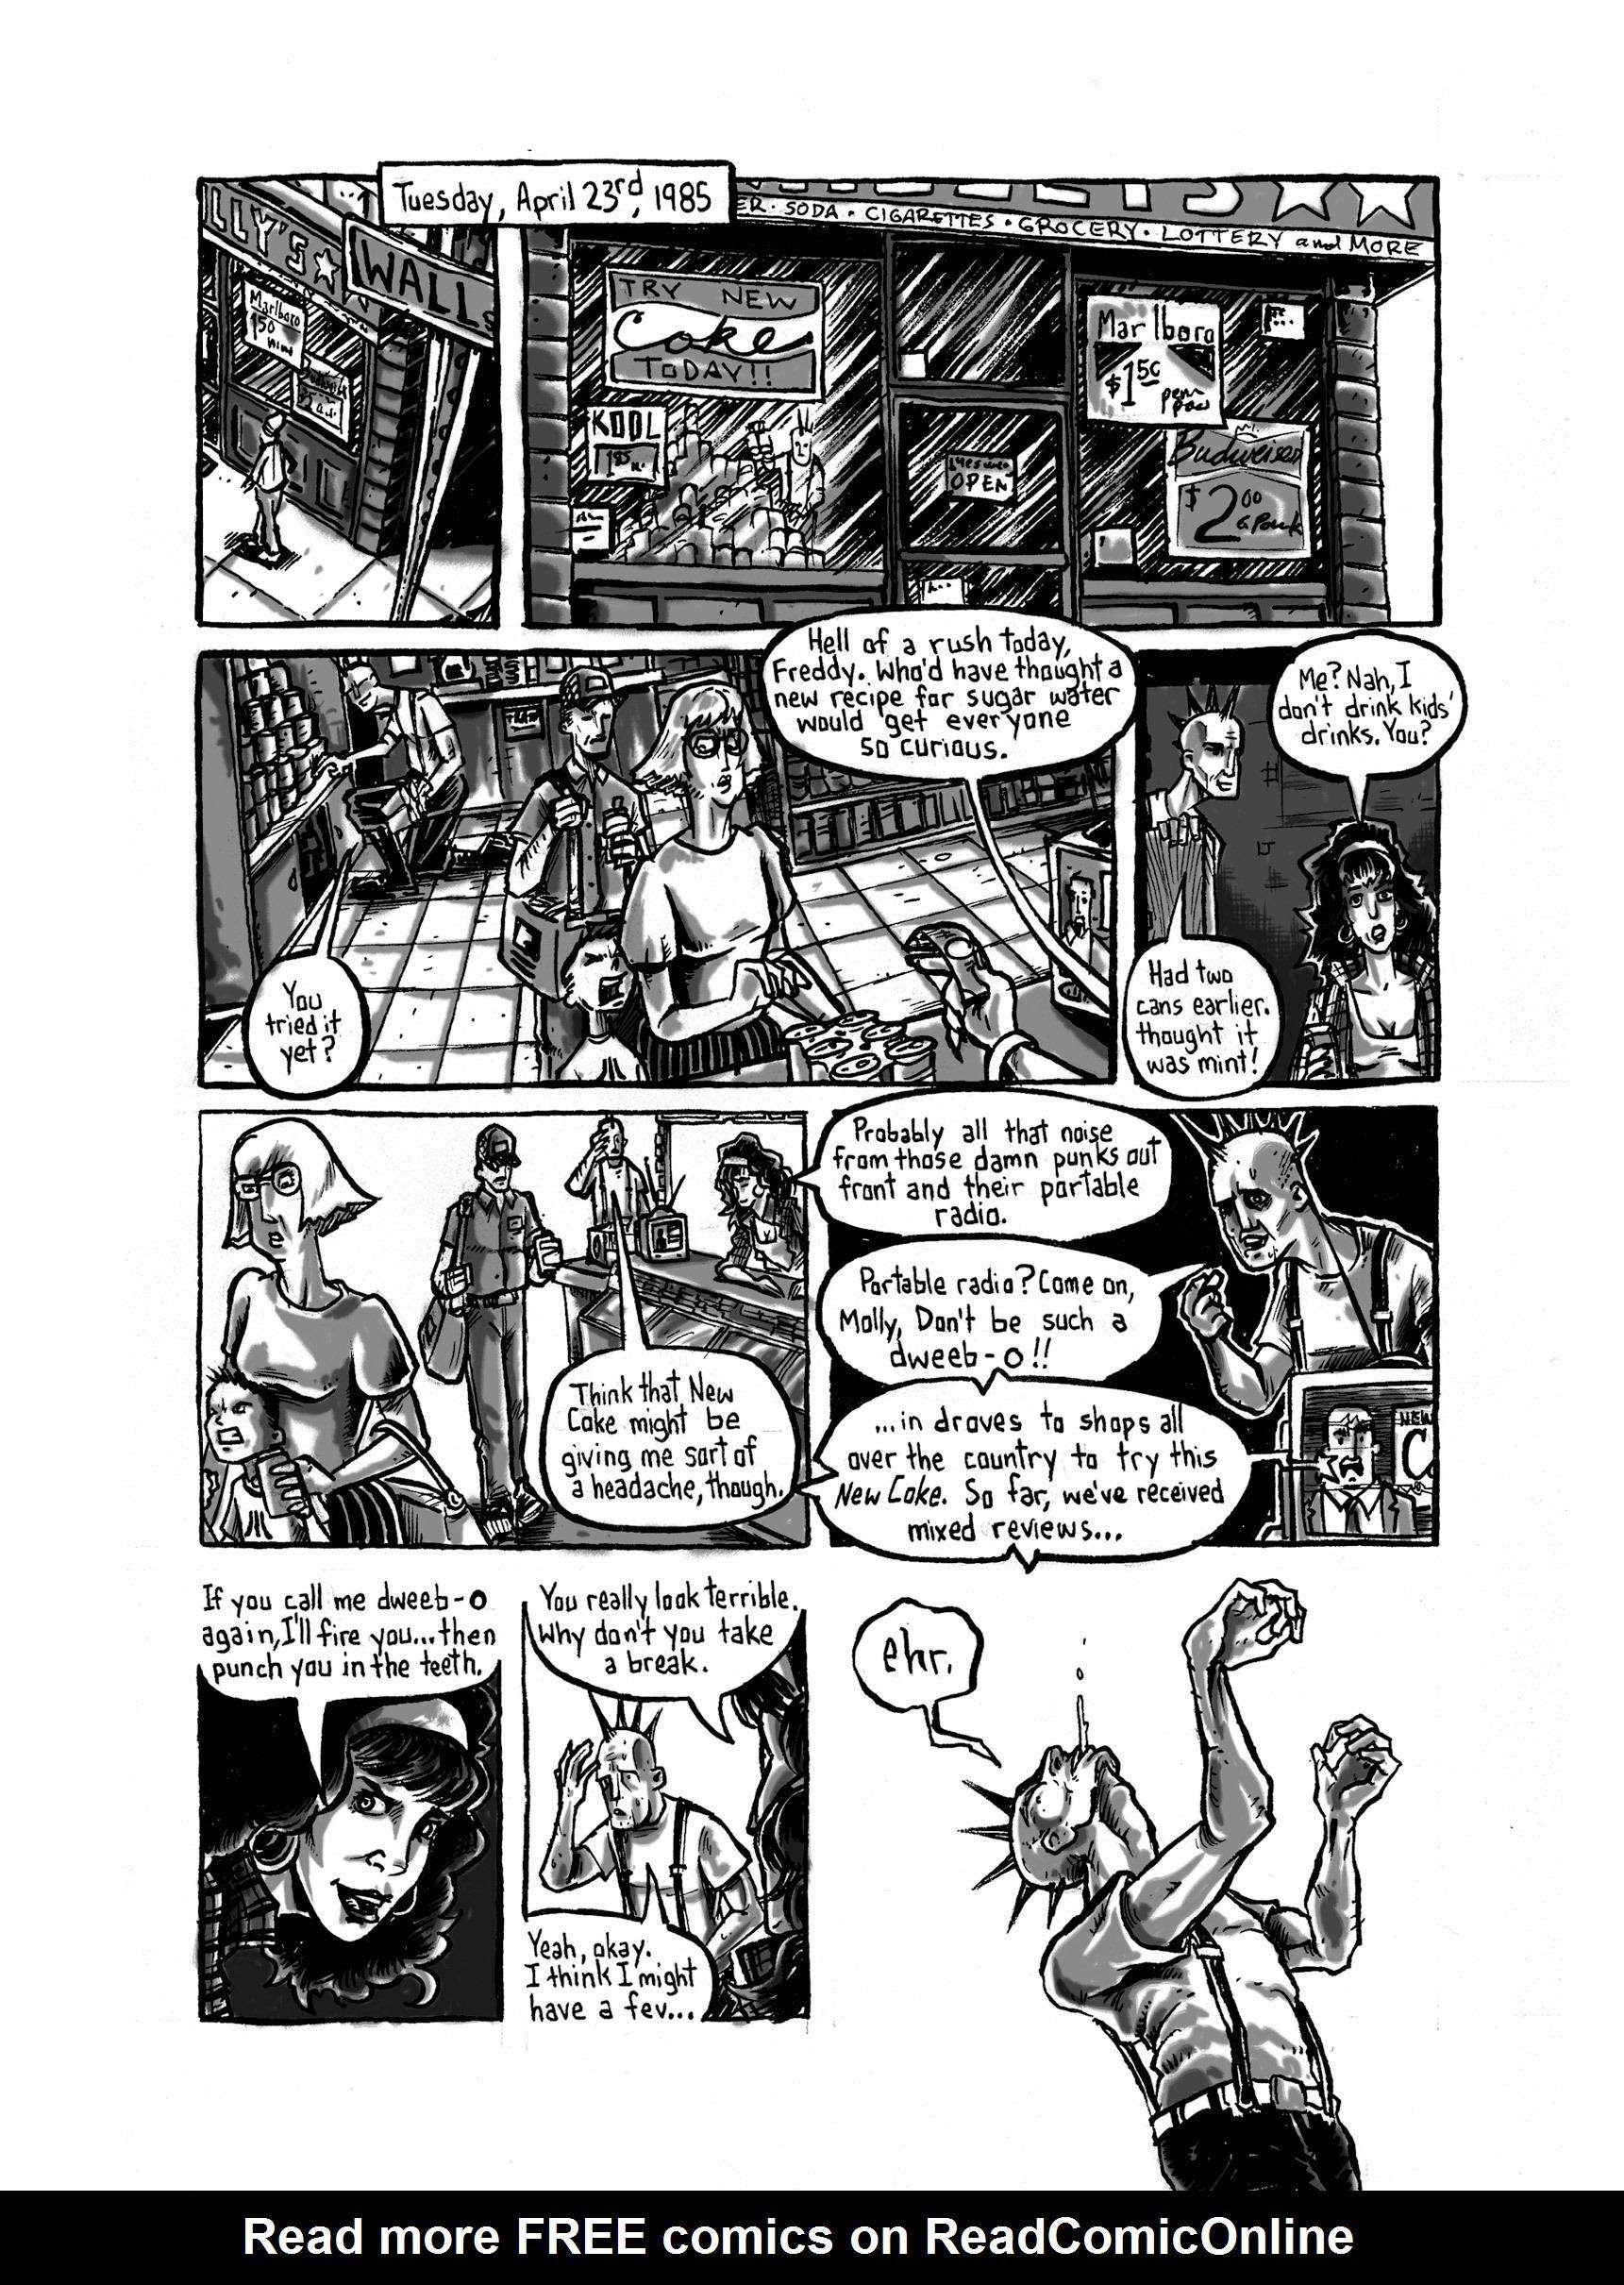 Read online FUBAR comic -  Issue #3 - 352